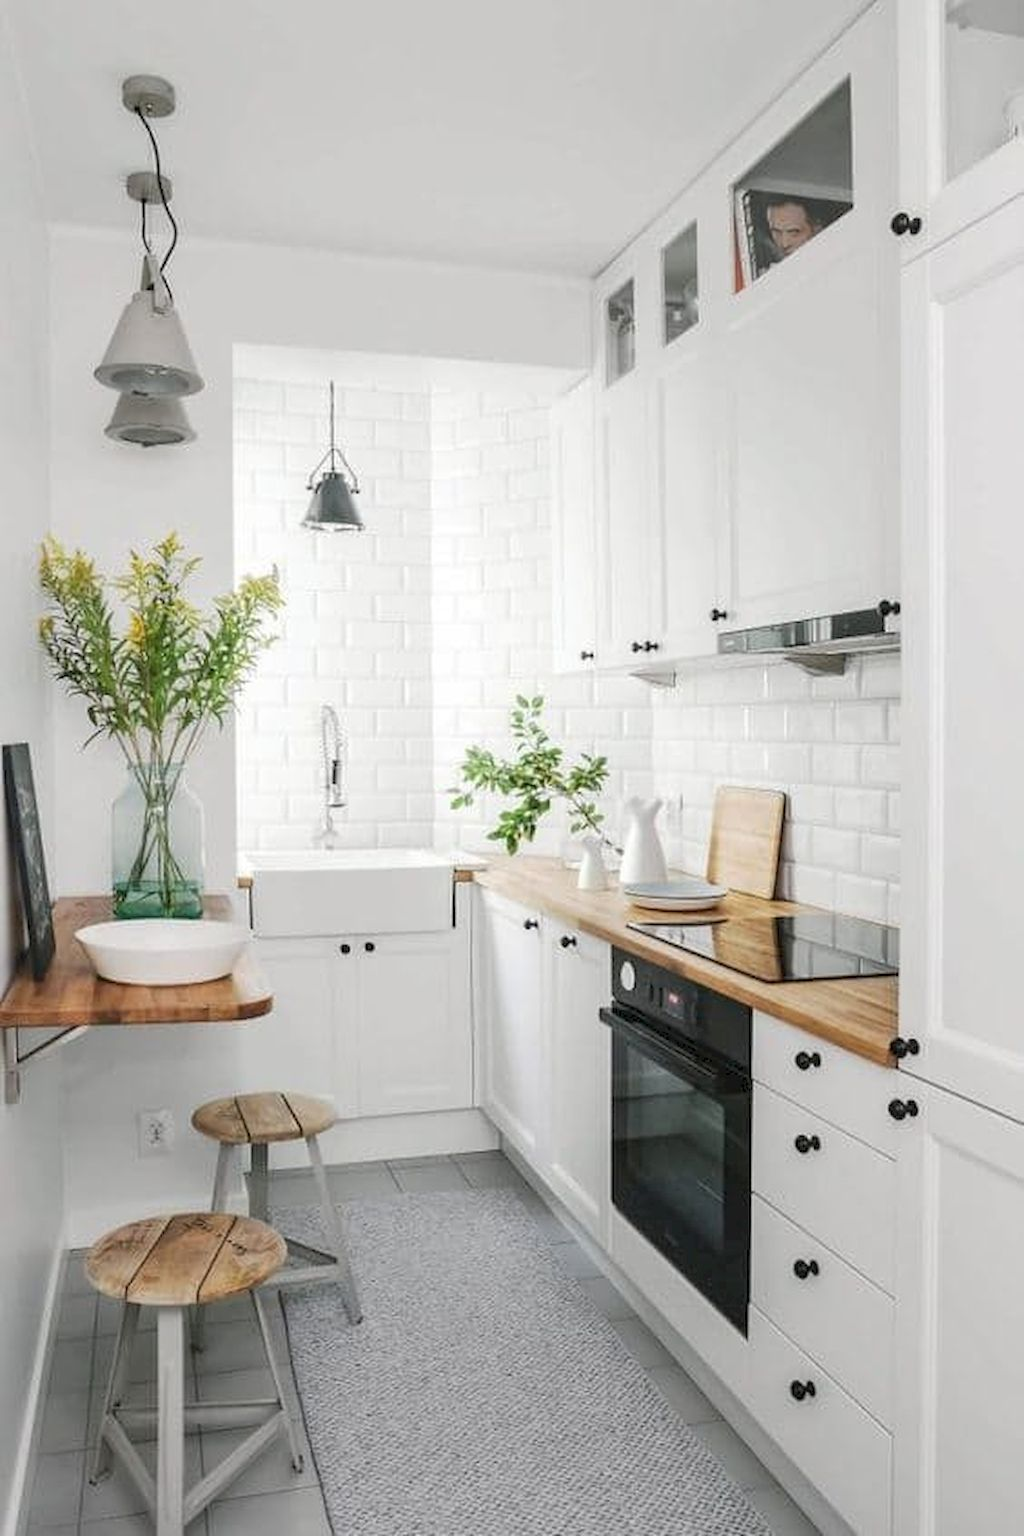 60 Small Kitchen Ideas Remodel  Kitchens Kitchen Decor And Simple Remodel Small Kitchen Ideas Design Decoration